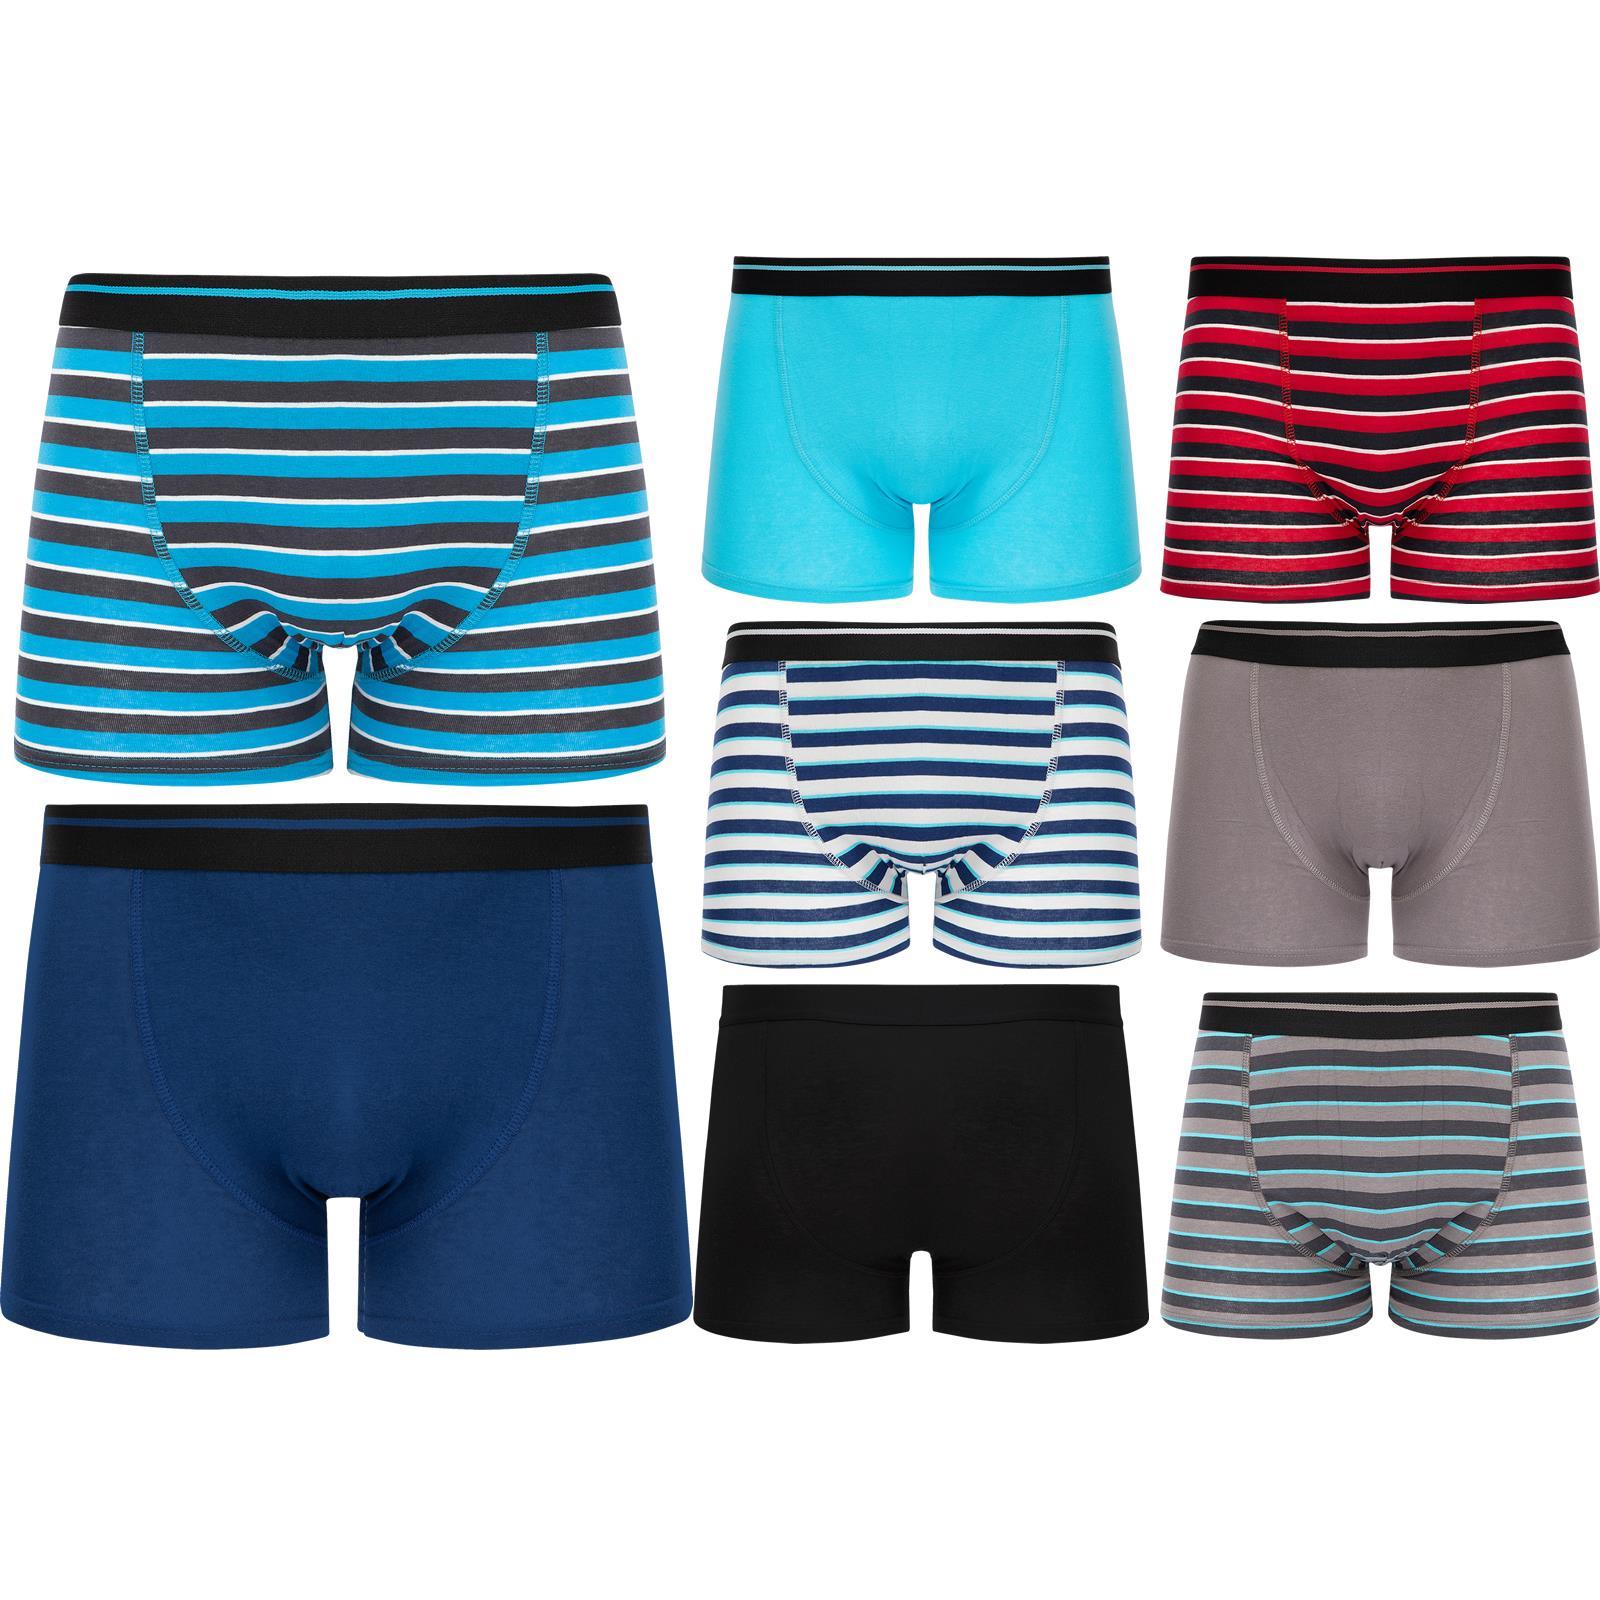 Remixx boxer shorts kids shorts and retro shorts 140-146 cm Pack of 10 Multicolour